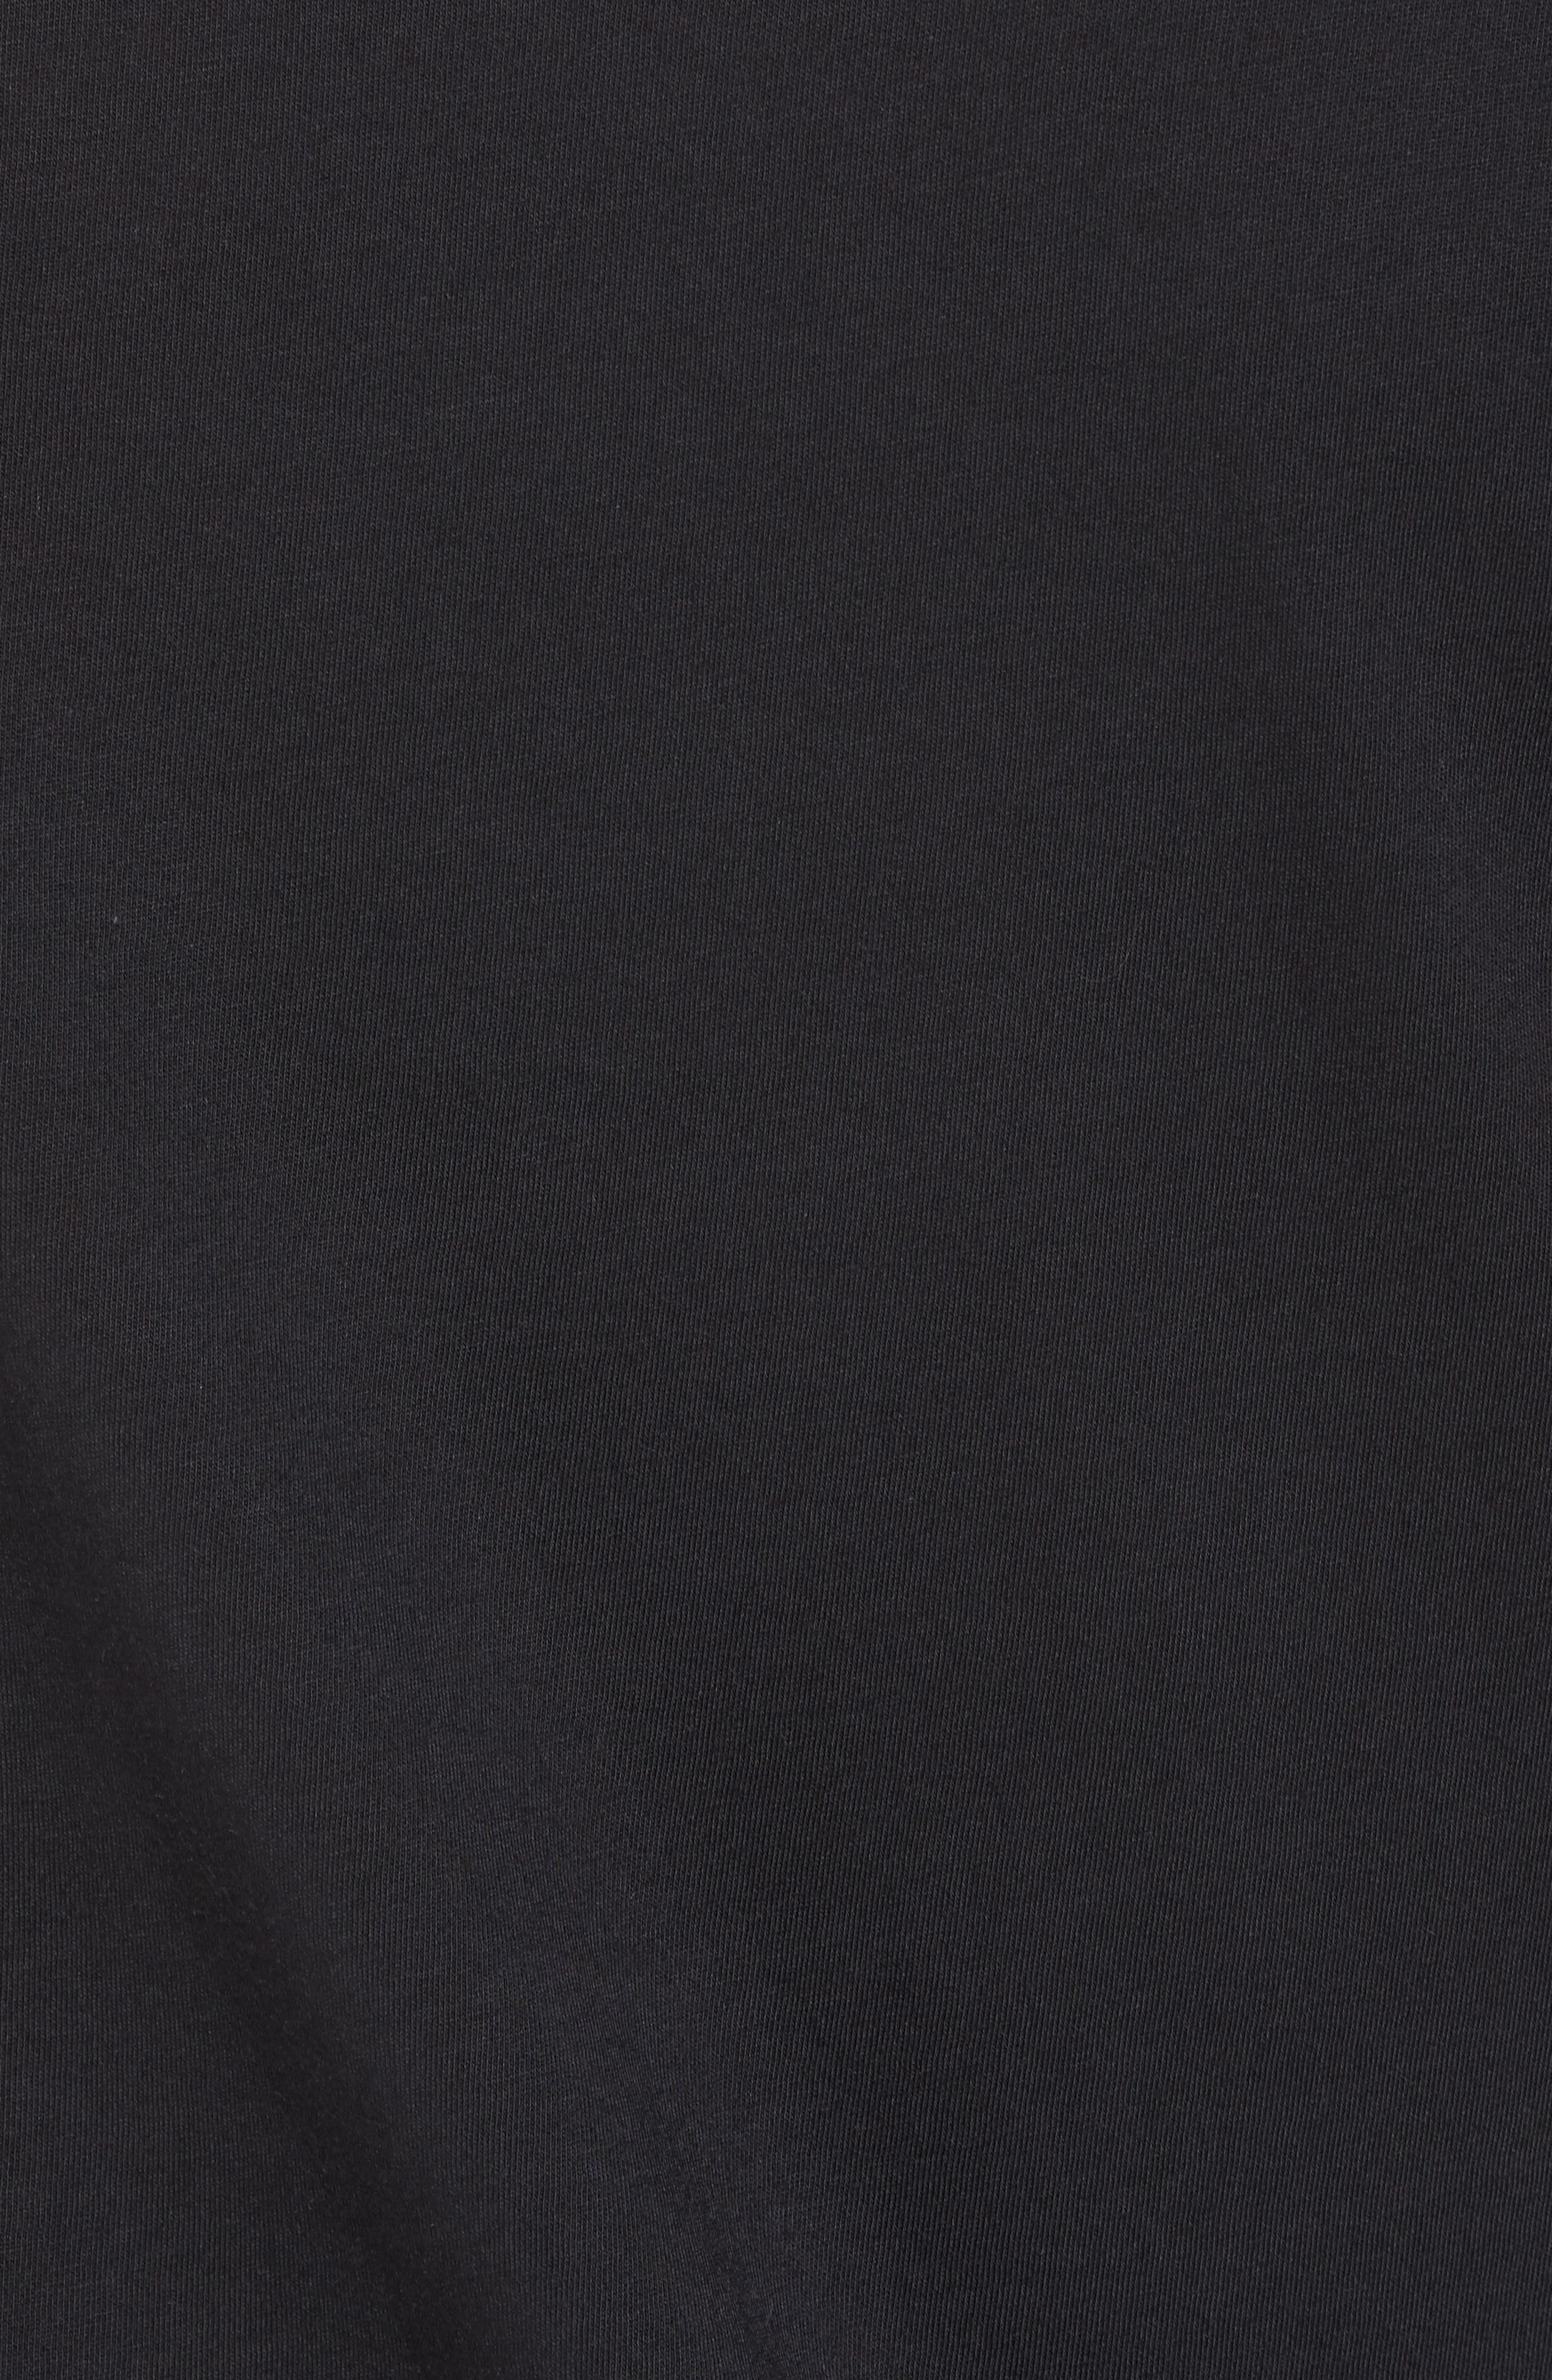 Guns N Roses Graphic T-Shirt,                             Alternate thumbnail 5, color,                             001